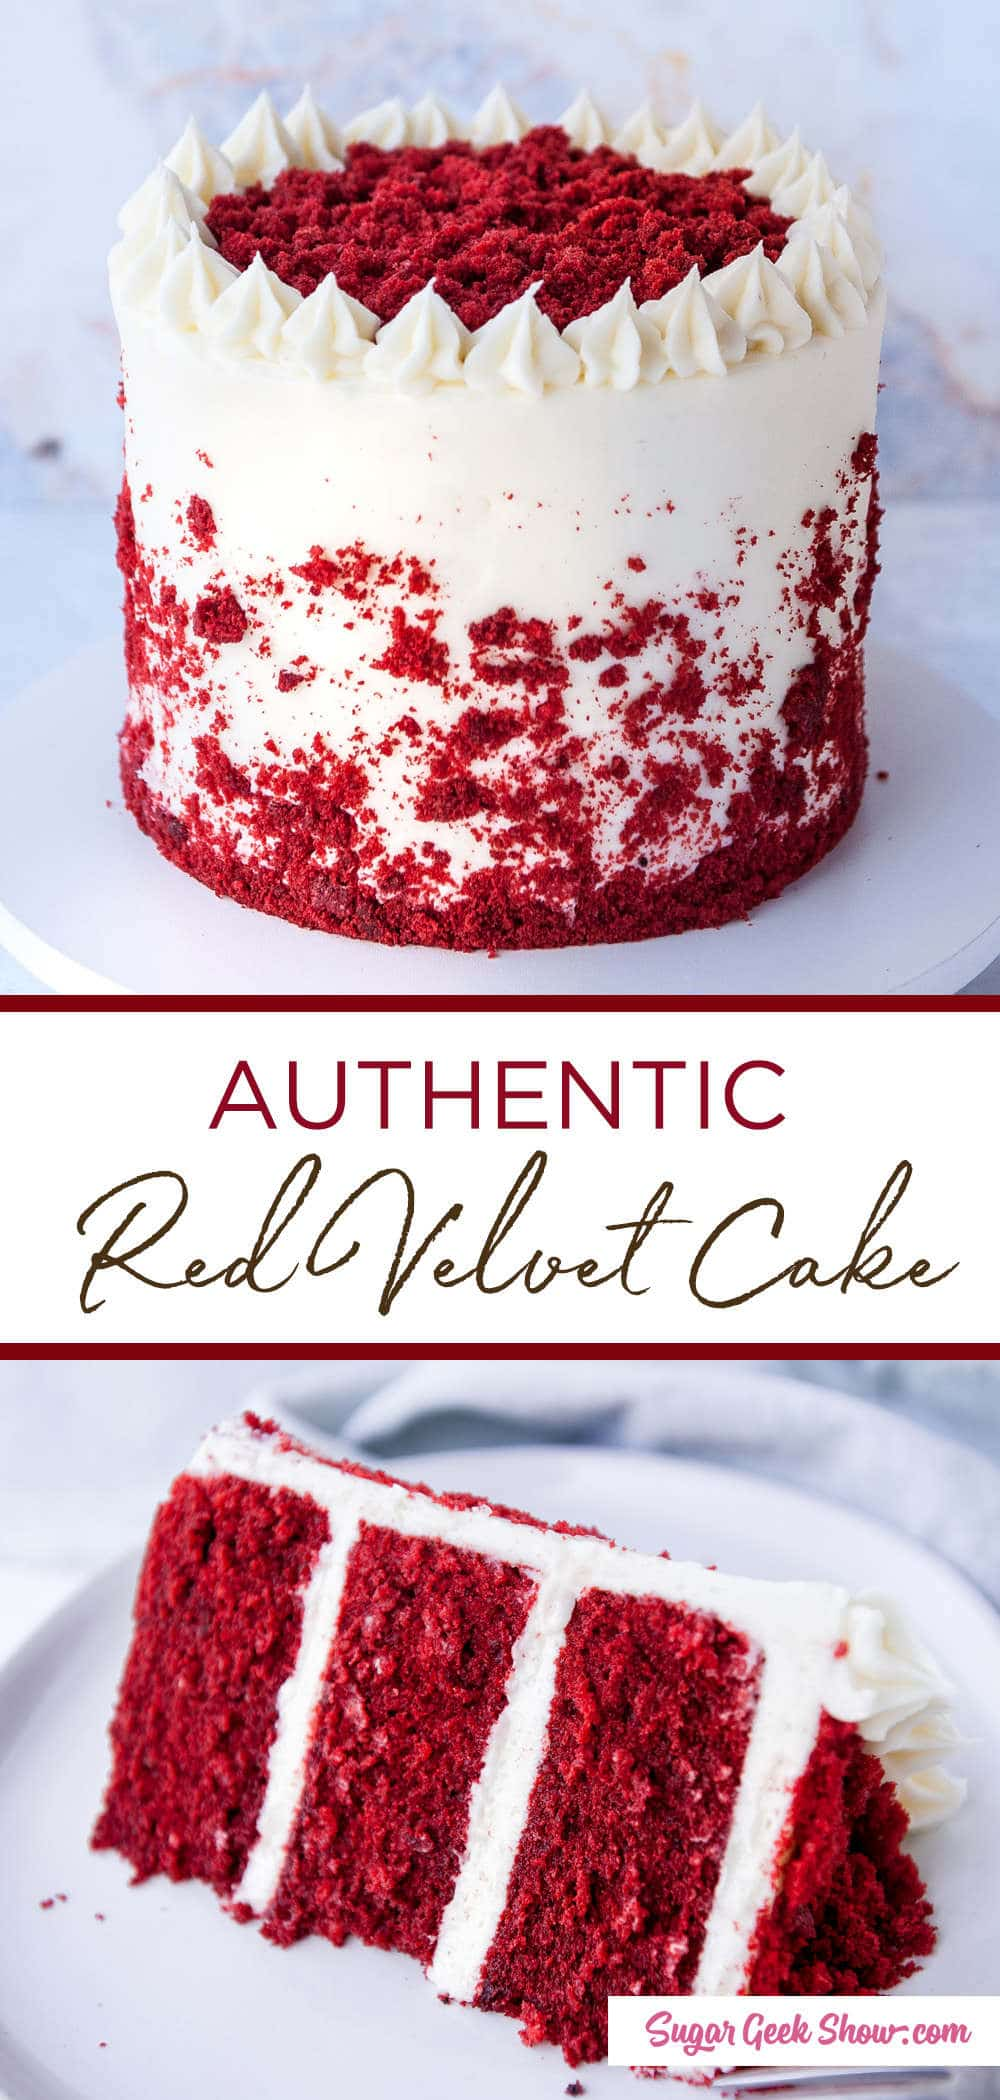 Classic Red Velvet Cake Recipe Cream Cheese Frosting Sugar Geek Show Recipe In 2020 Chocolate Cake Recipe Velvet Cake Recipes Cake Recipes